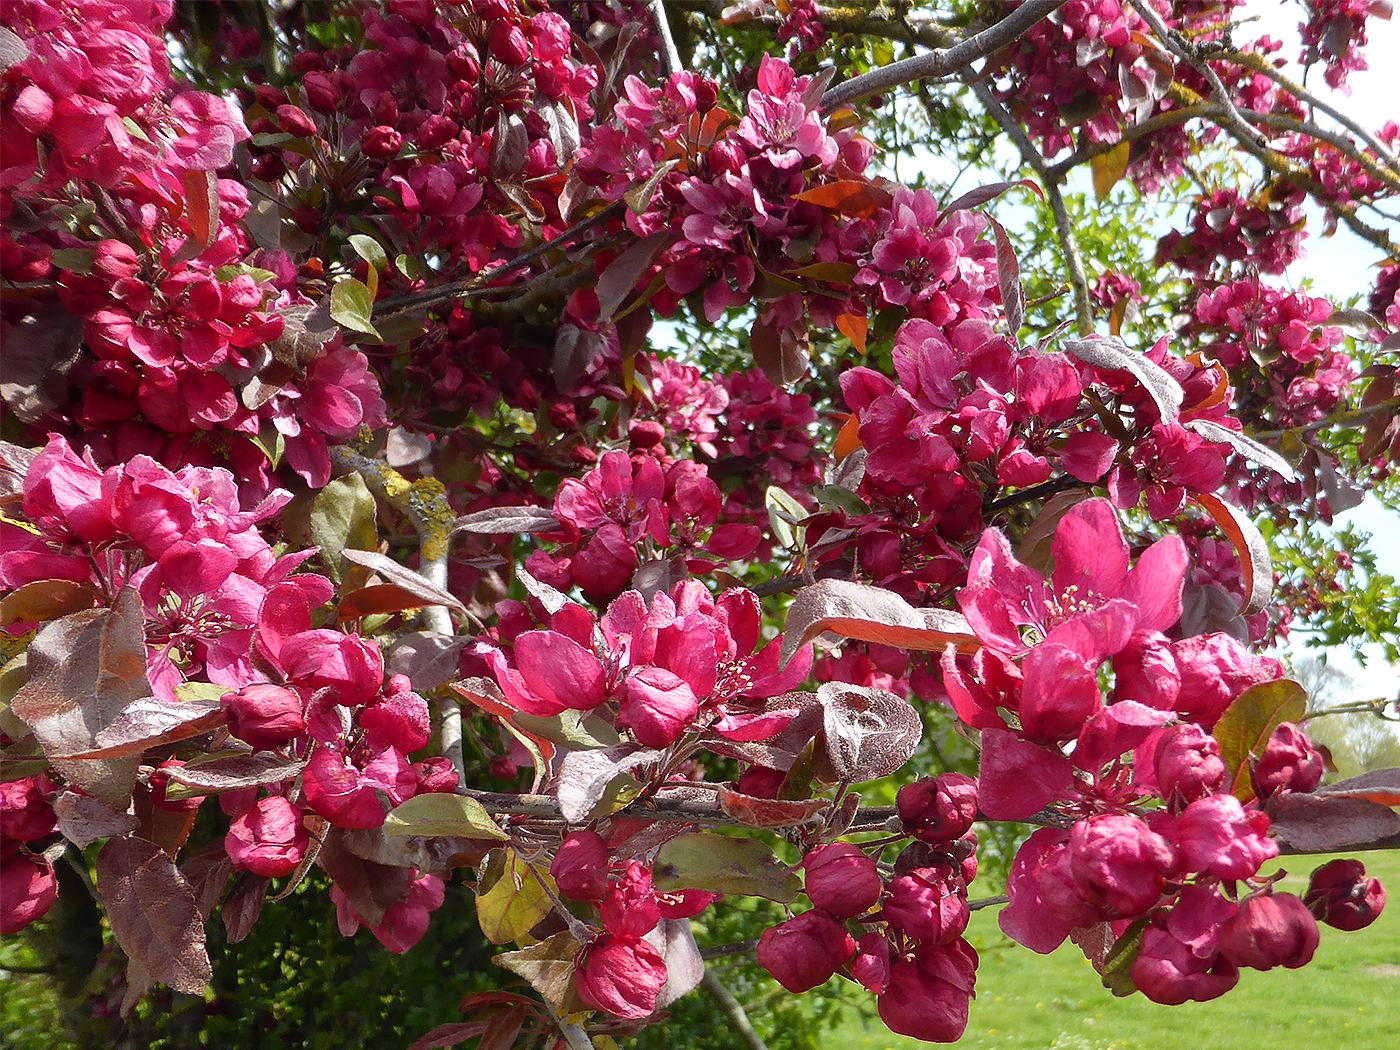 'Hawthorn Tree' by Richard Temlett